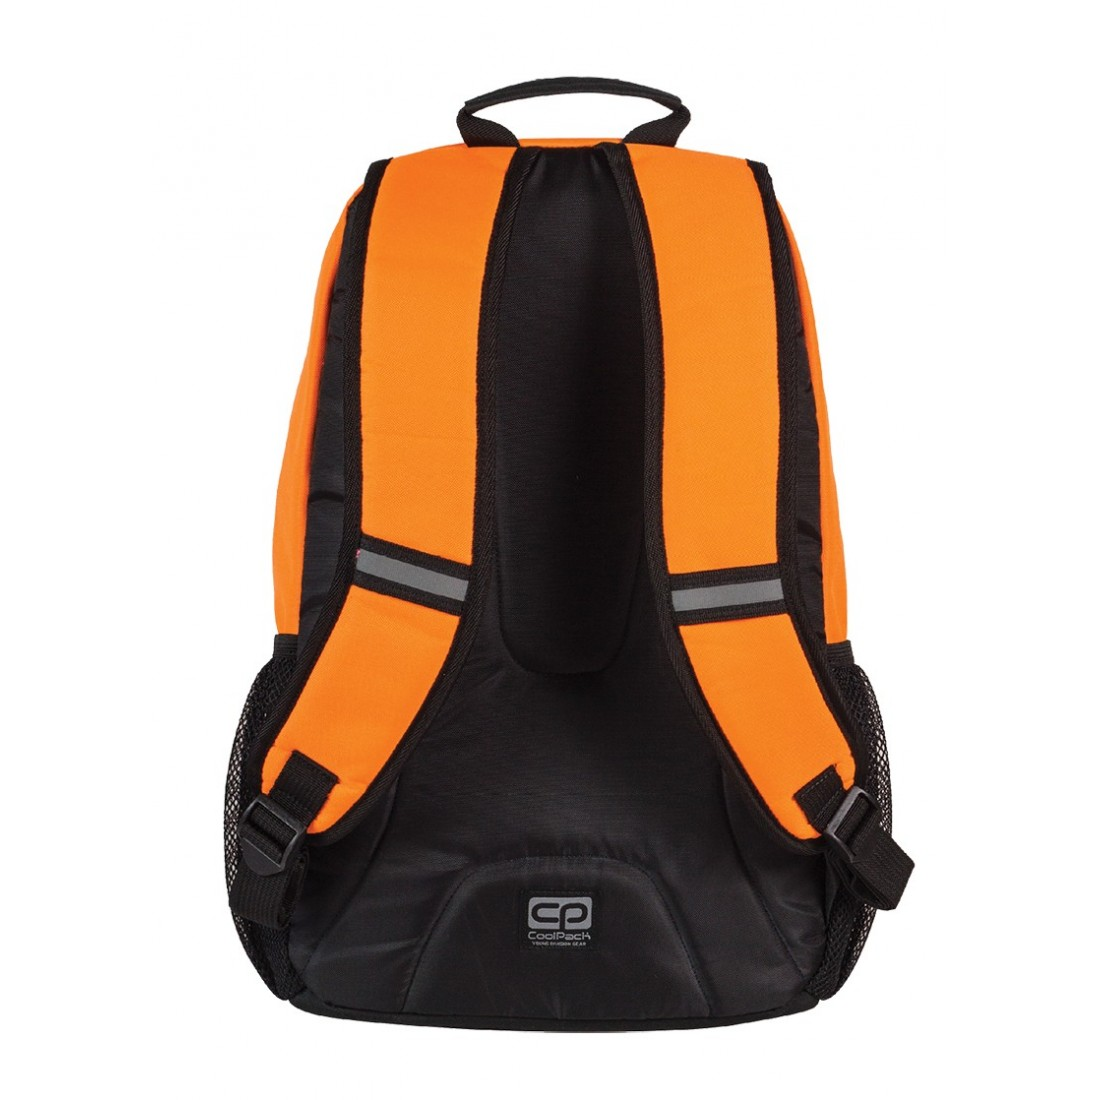 Plecak młodzieżowy CoolPack ACTION 2 przegrody ORANGE NEON CP 430 - plecak-tornister.pl